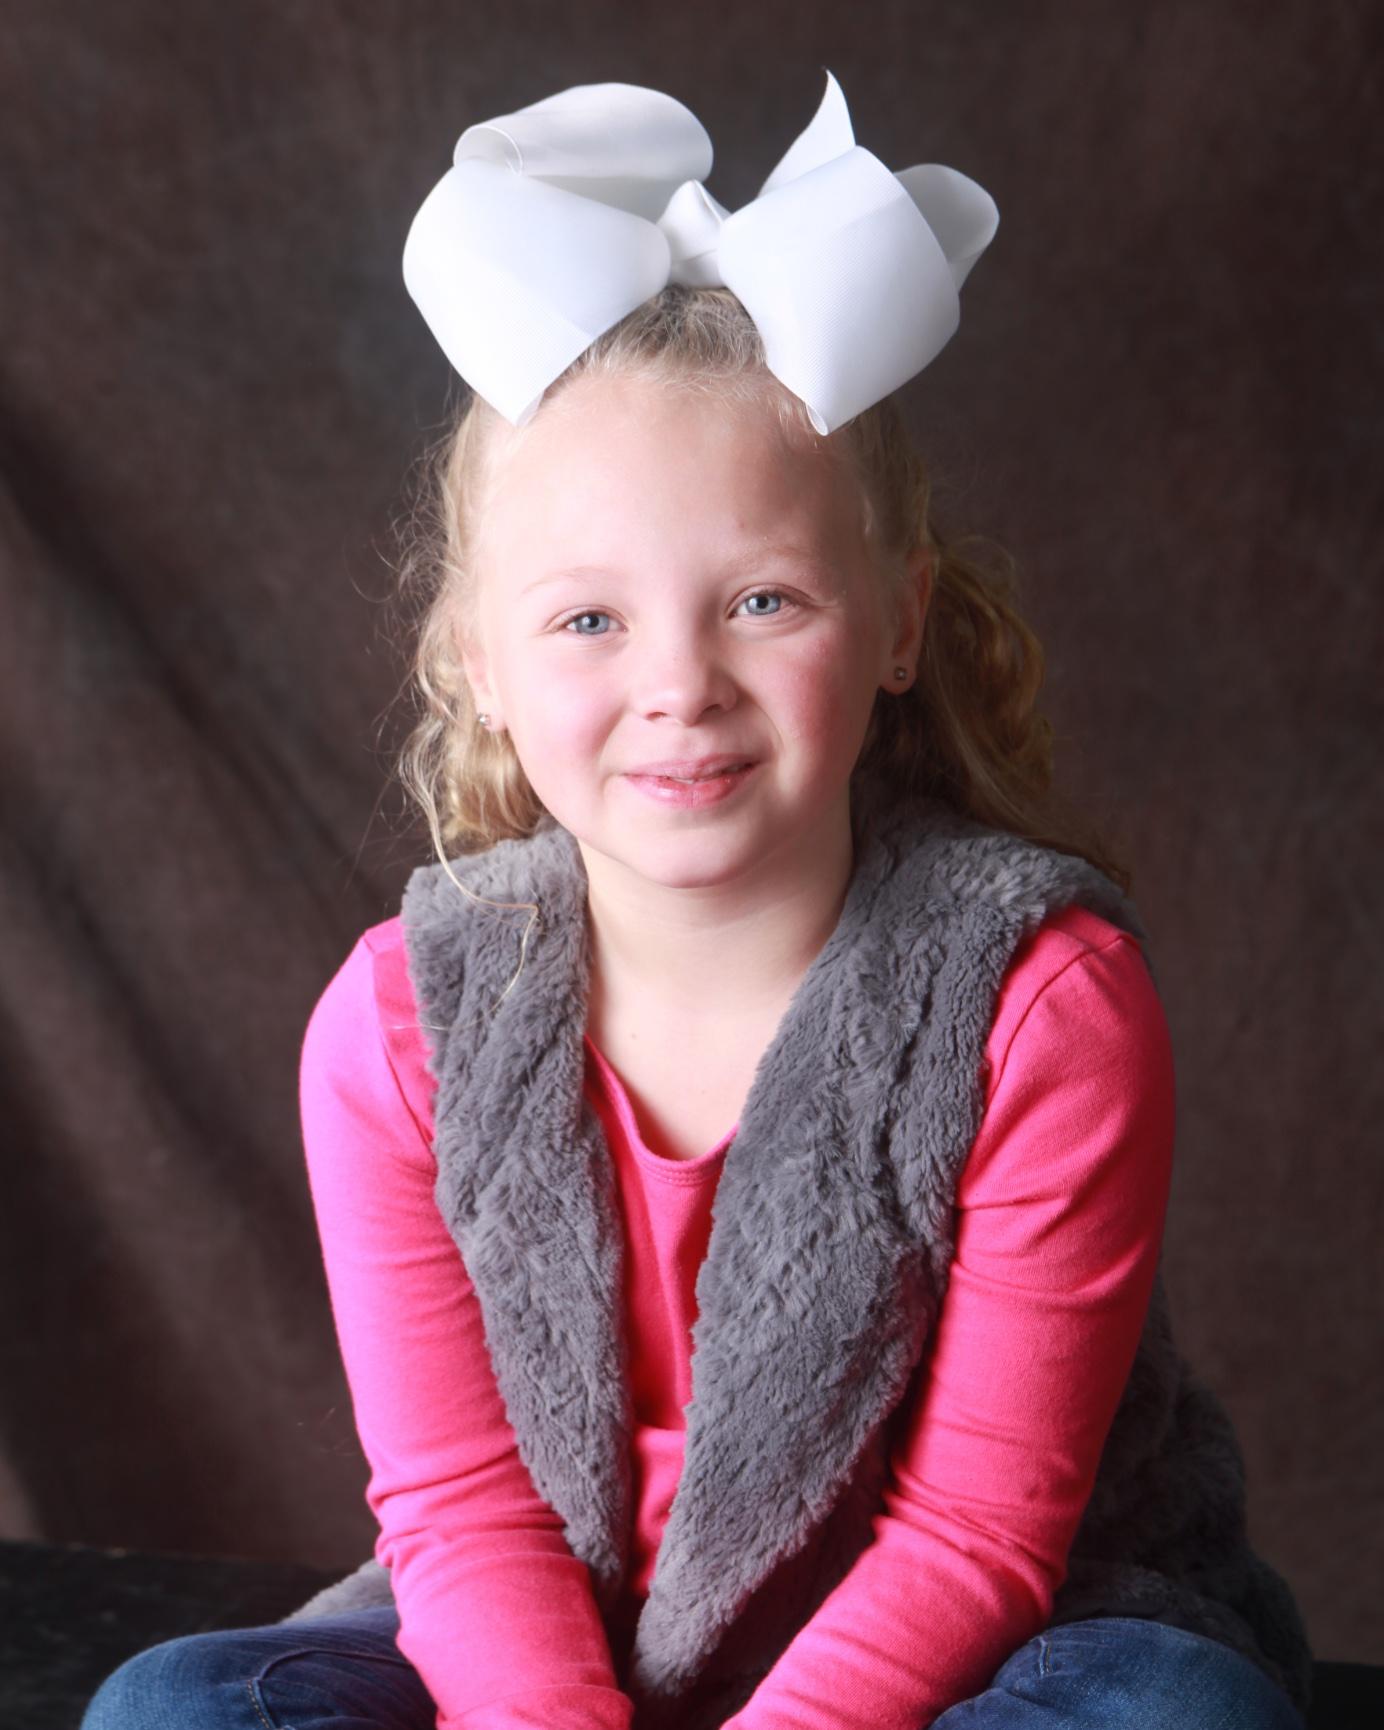 Kaitlyn Johnson, 8, Royse City